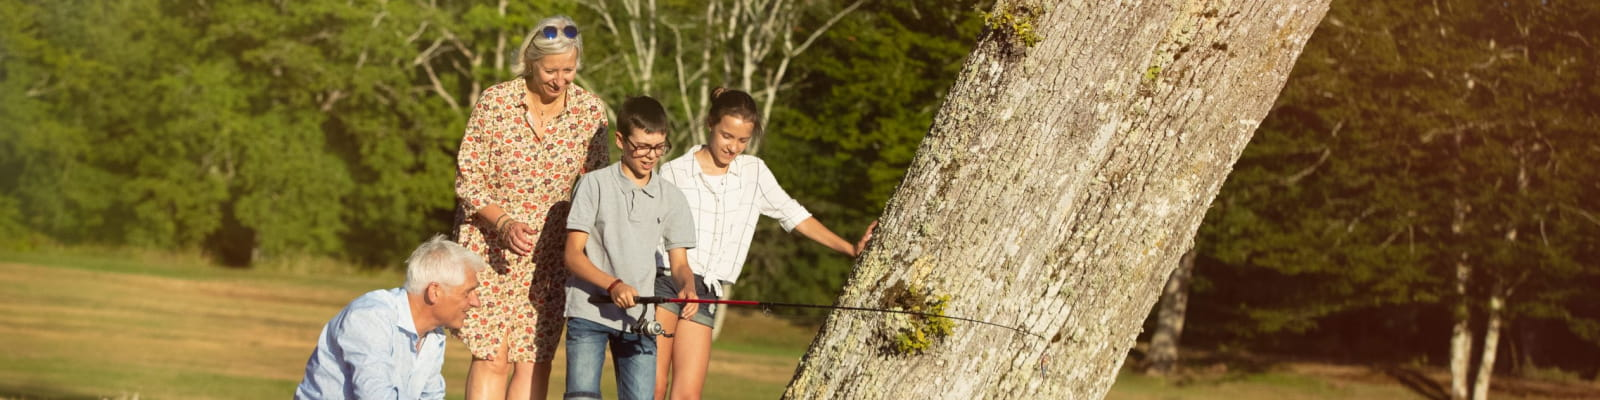 Grands-parents et petits-enfants qui pêchent